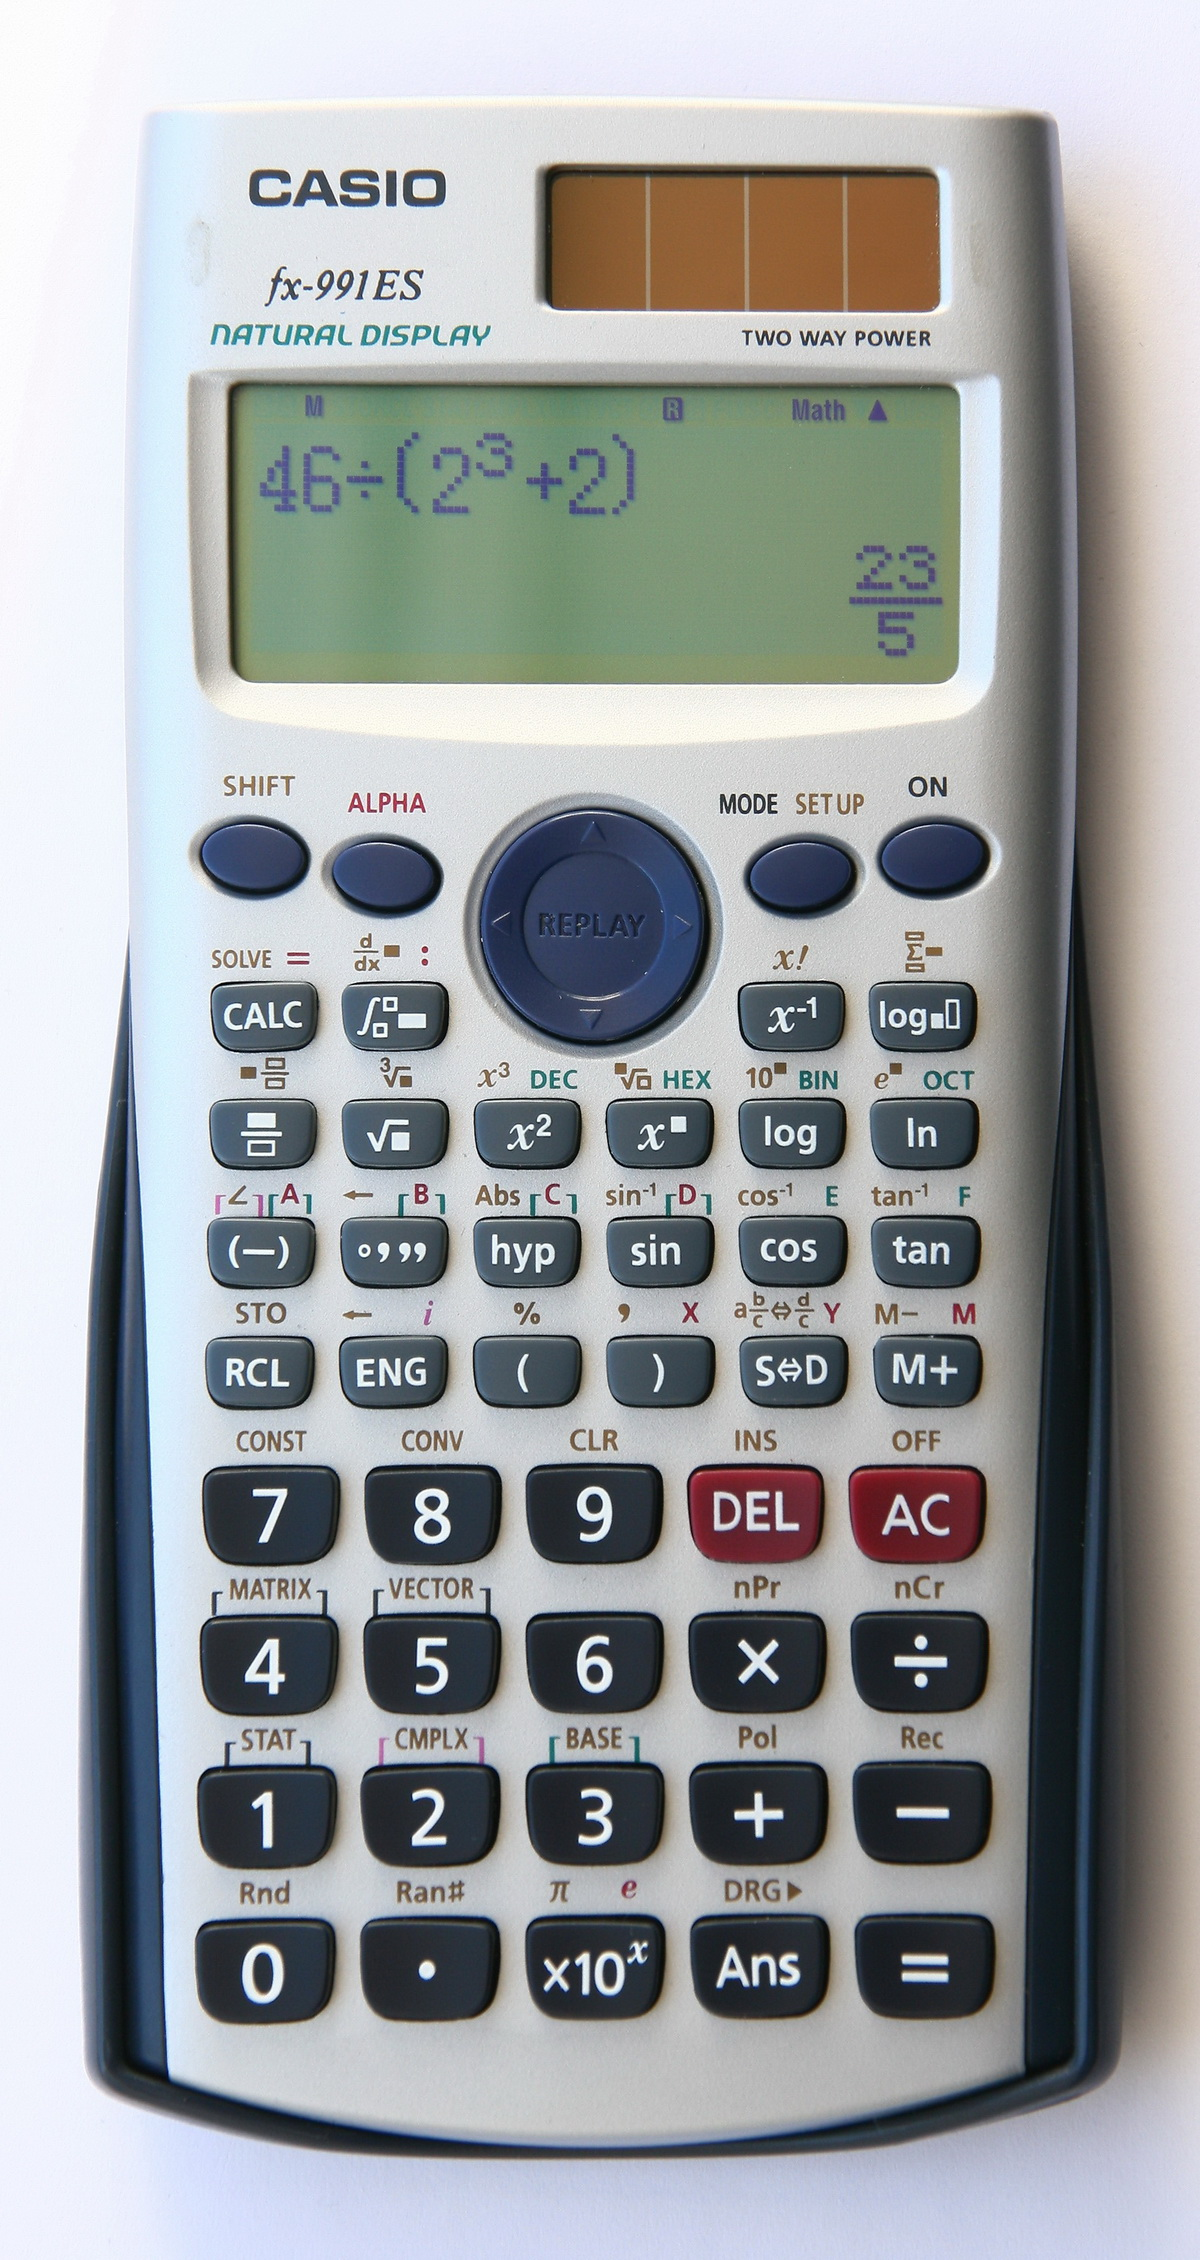 Калькулятор casio fx-991 es | festima. Ru мониторинг объявлений.